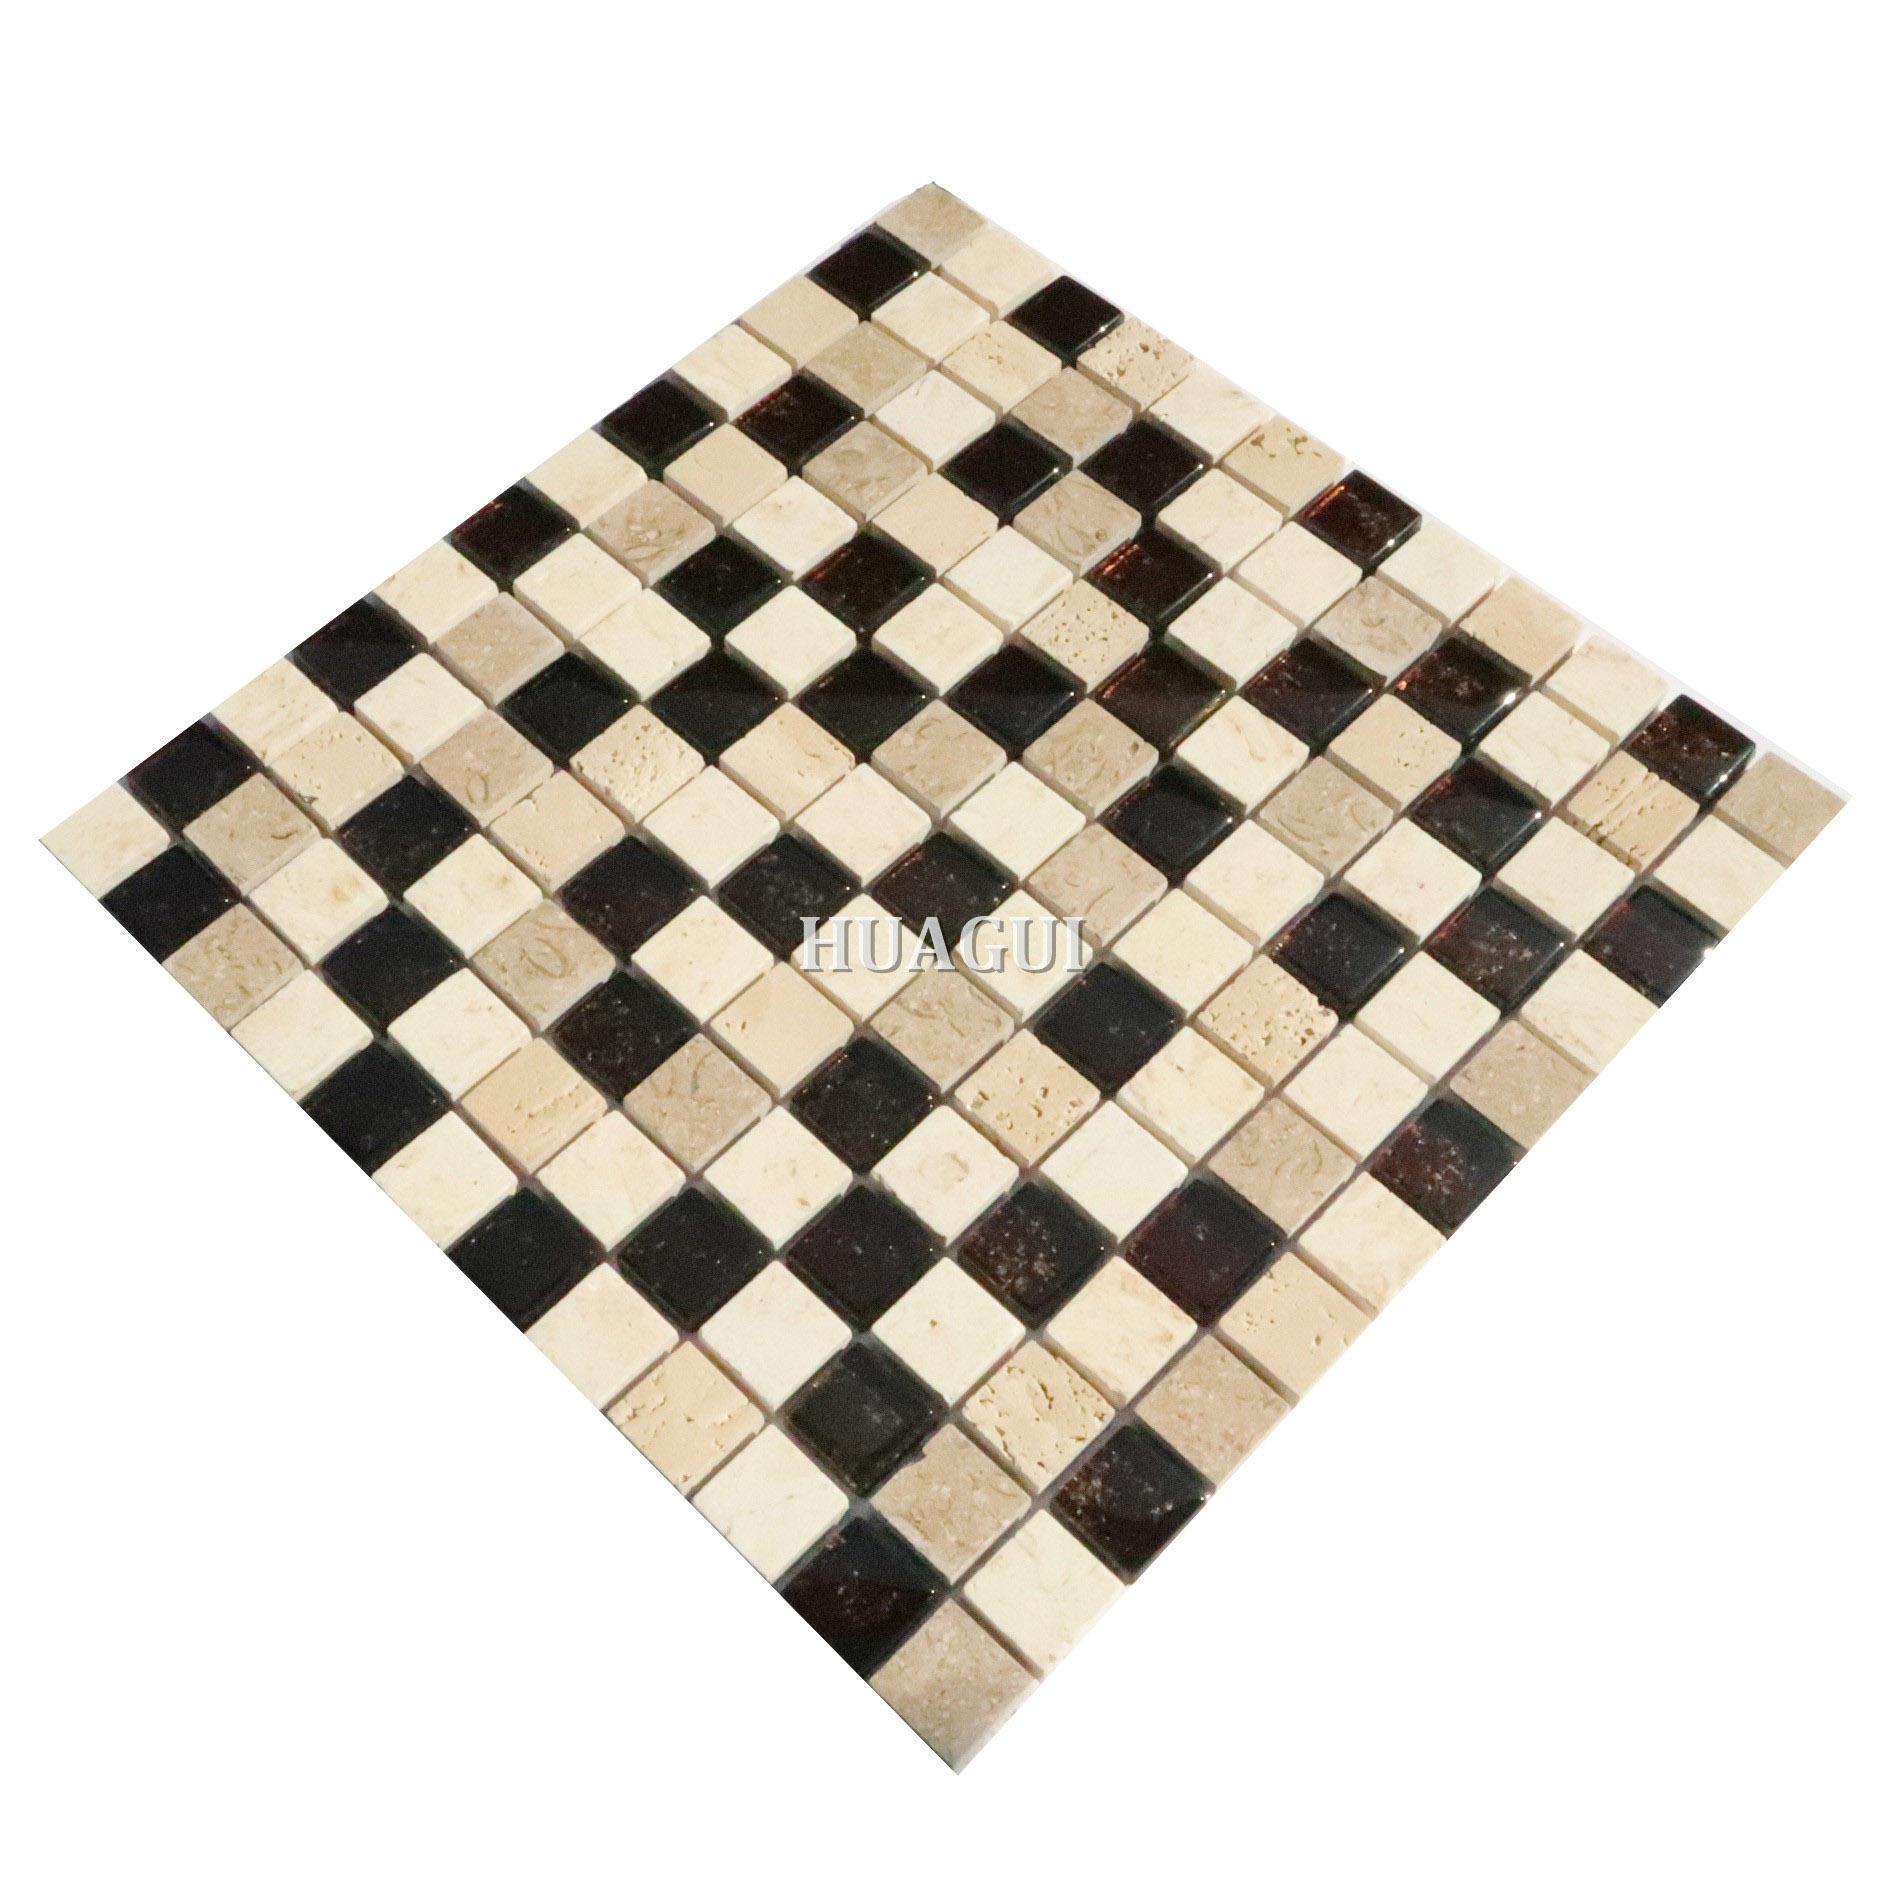 Natural stone mix glass mosaic backsplash floor tiles stores